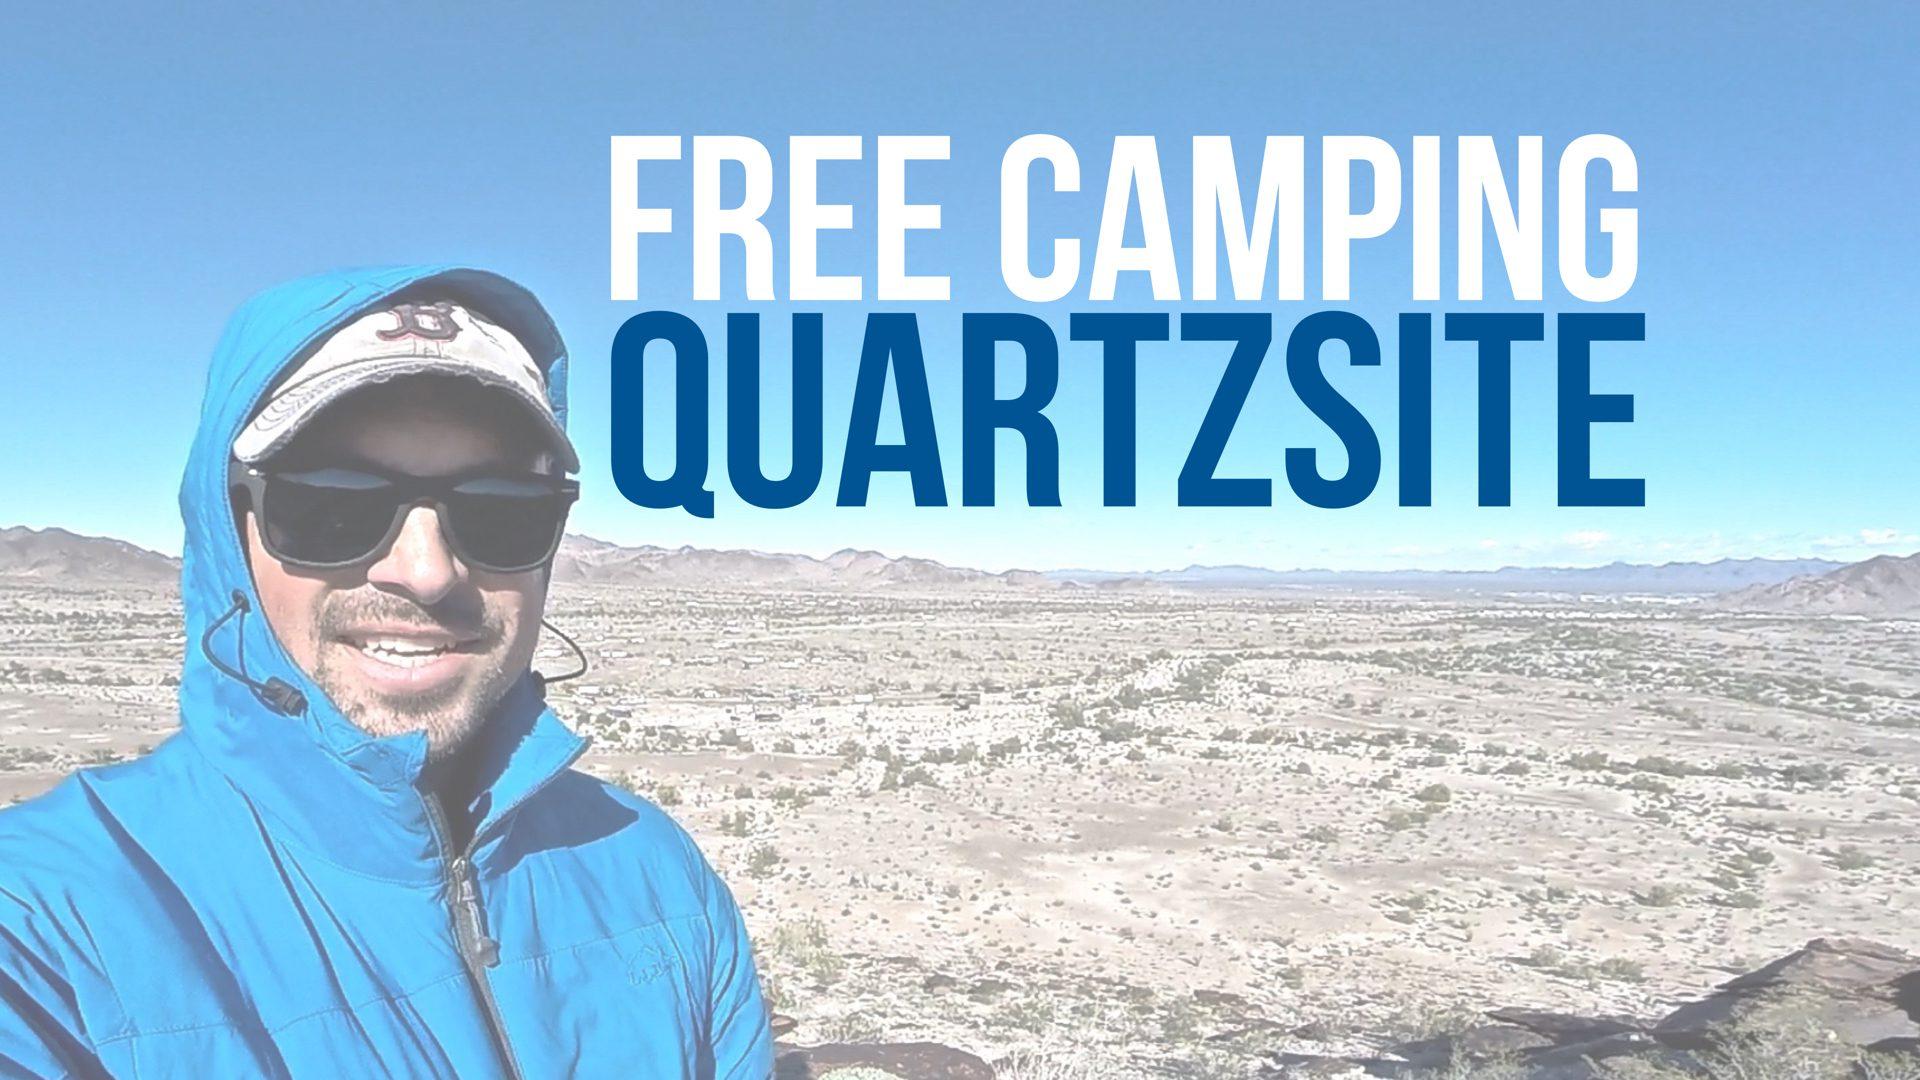 Free Camping in Quartzsite, Arizona // West Dome Rock Road